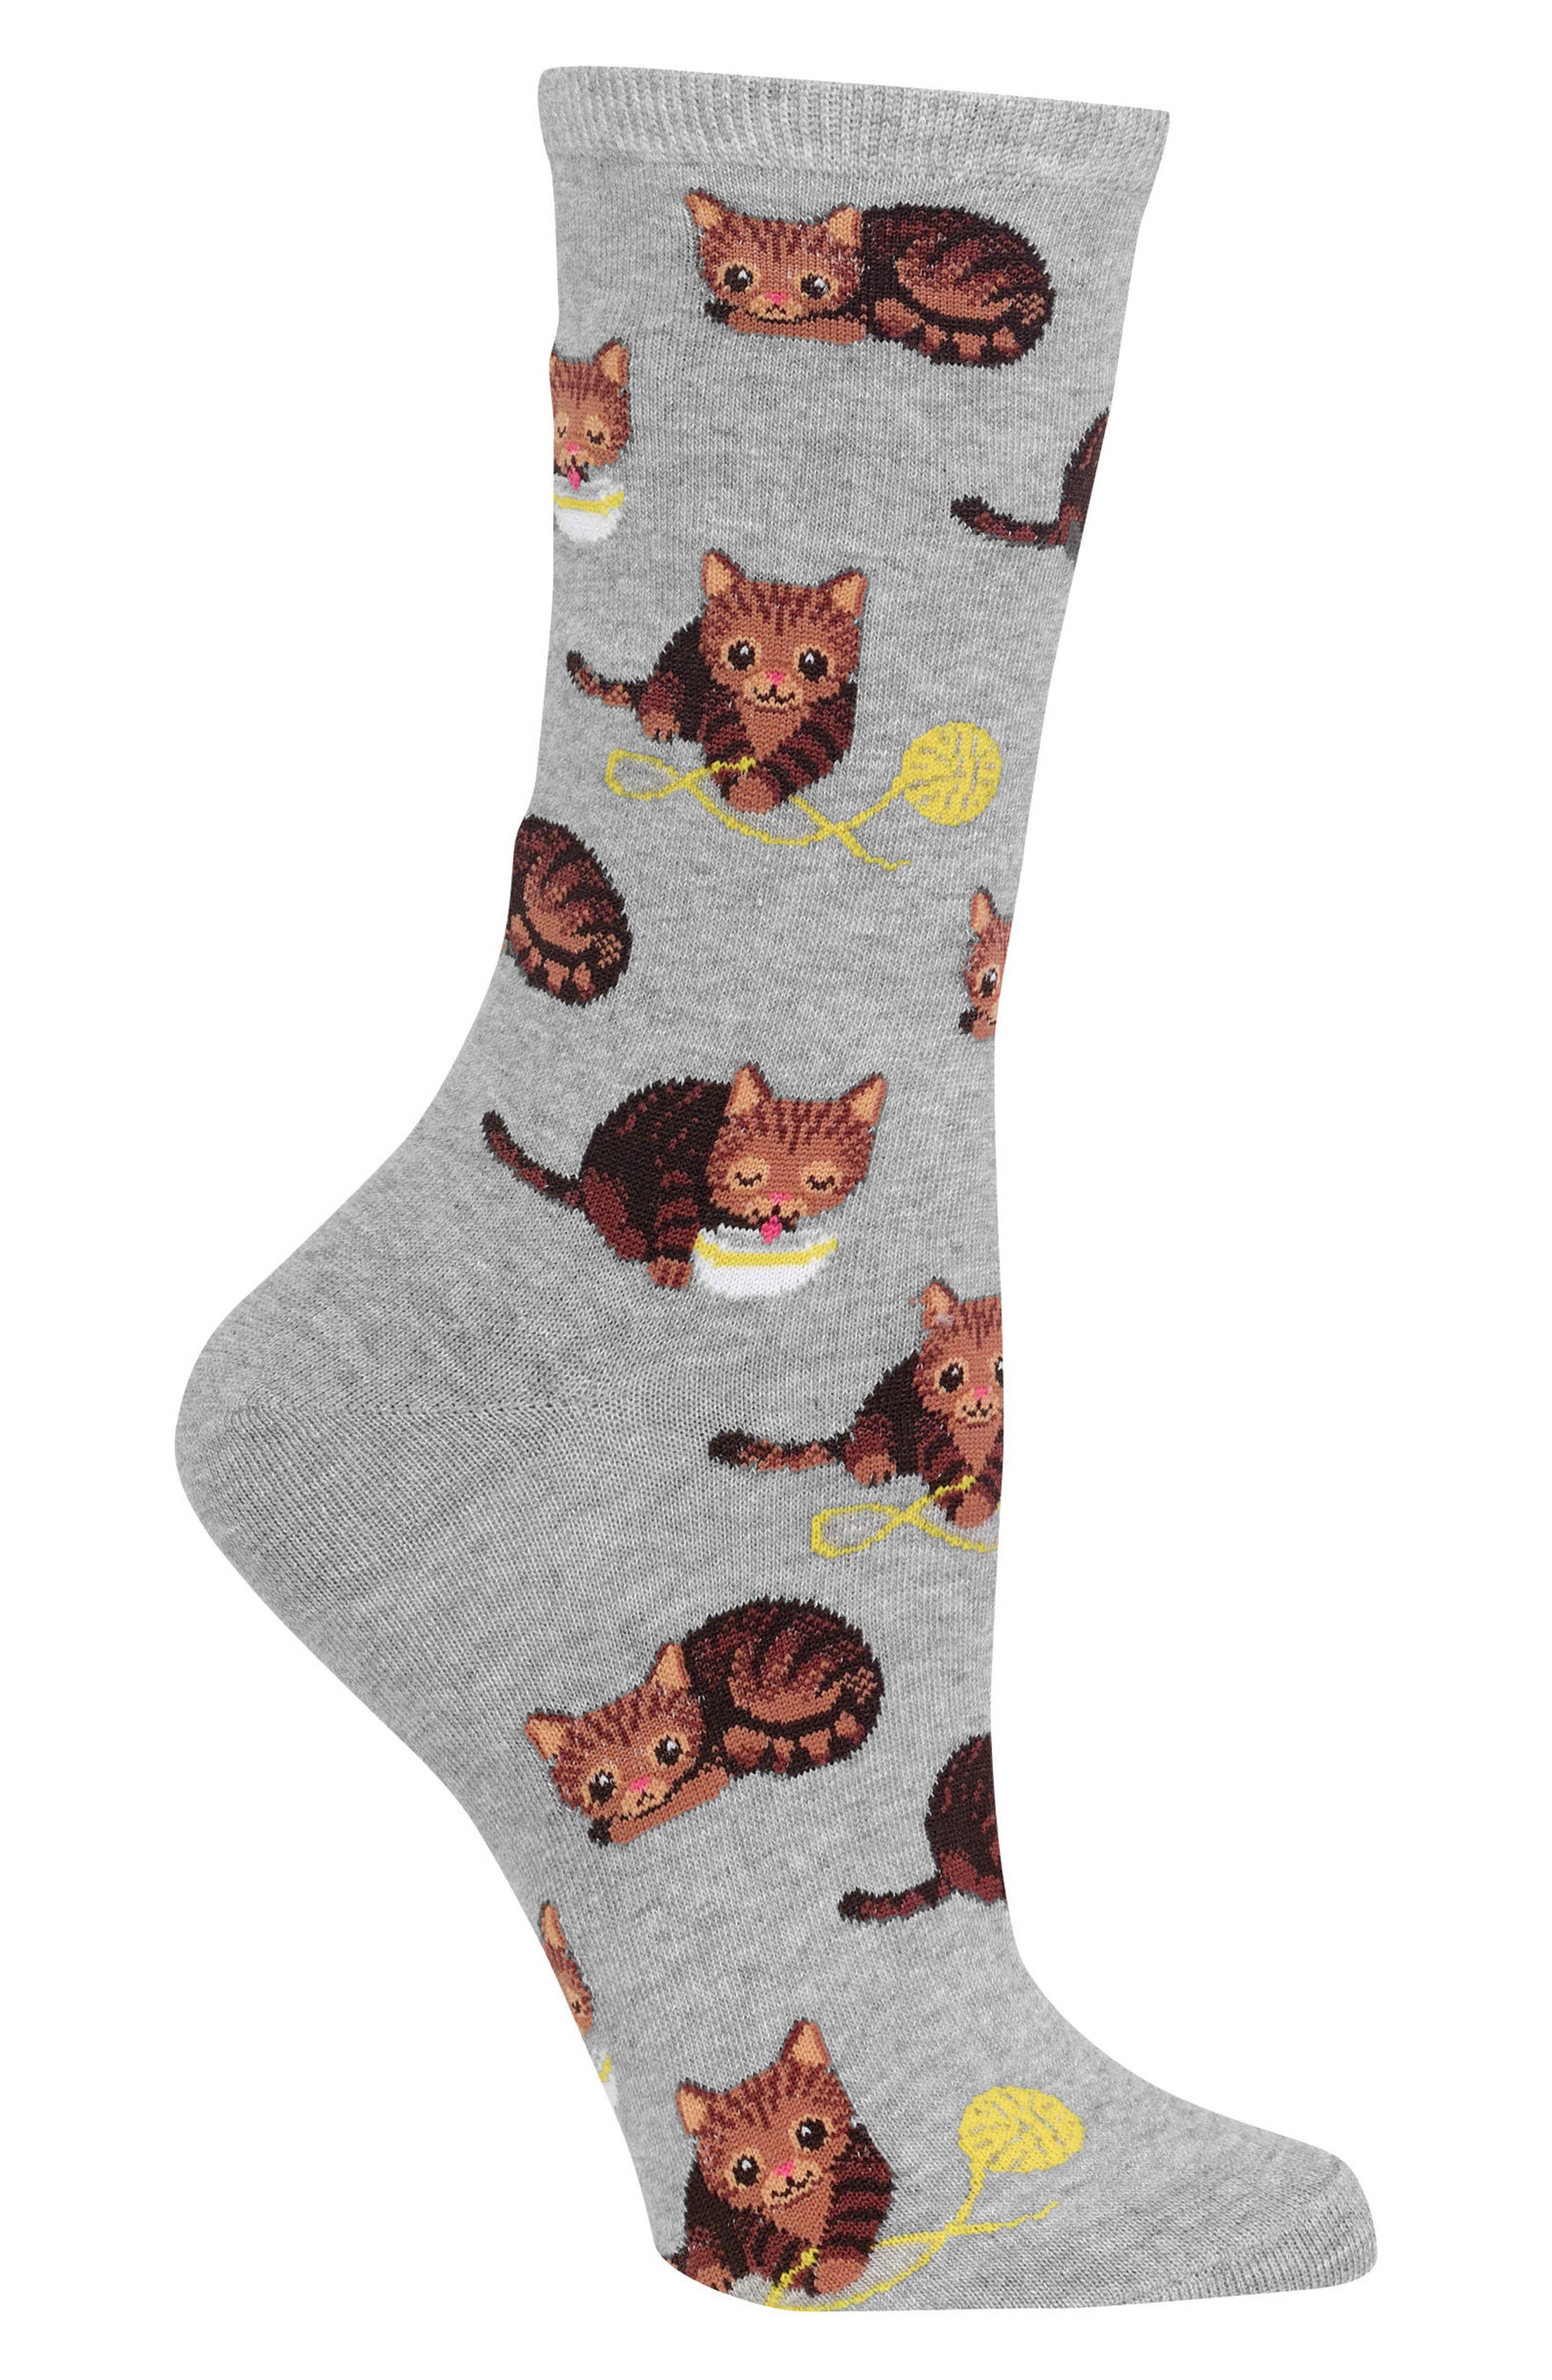 Cat & Yarn Crew Socks,                             Alternate thumbnail 2, color,                             Grey Heather